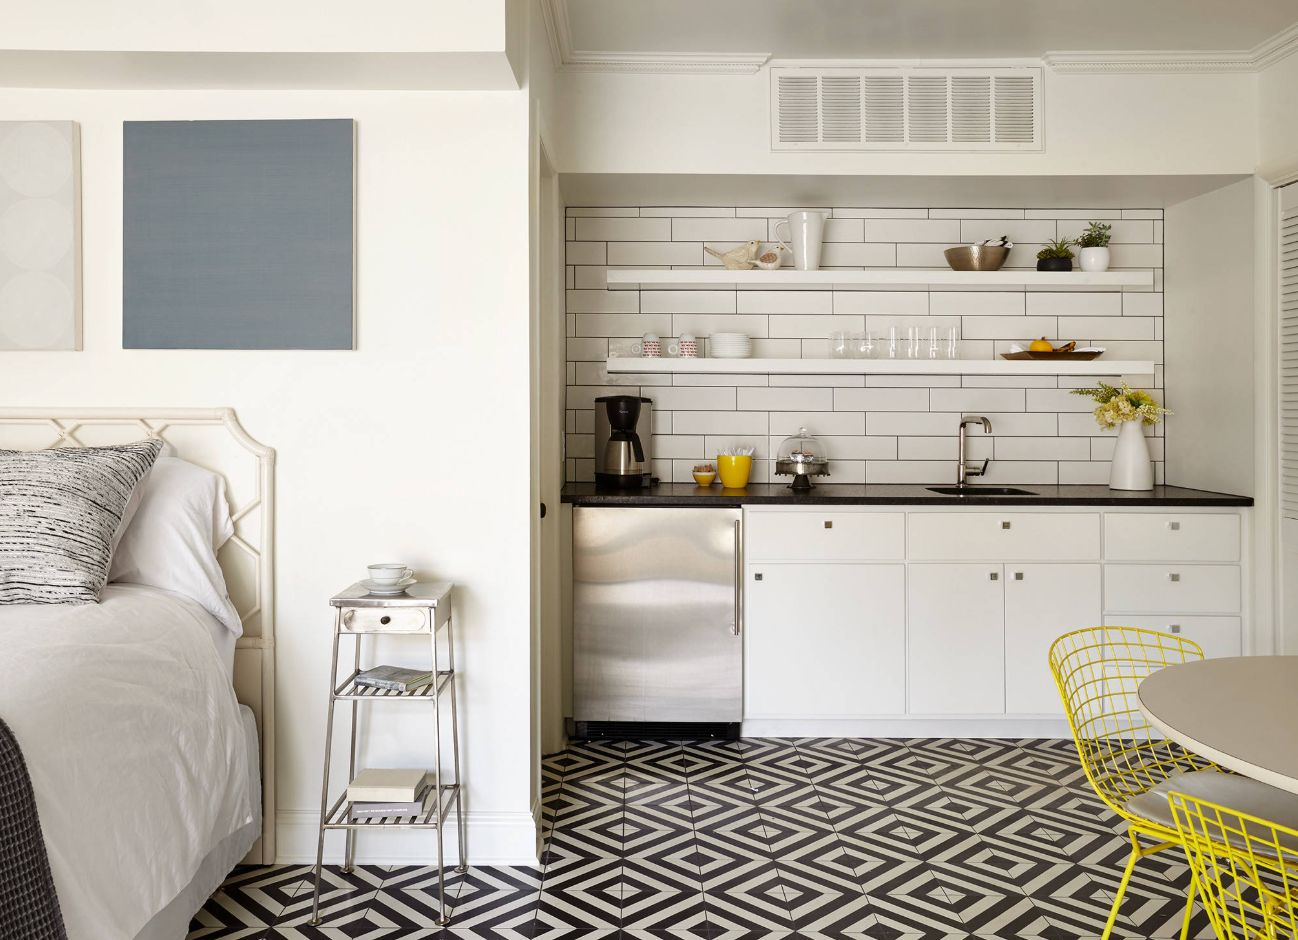 Astounding 10 Stylish Kitchenettes With Optimized Designs Interior Design Ideas Apansoteloinfo